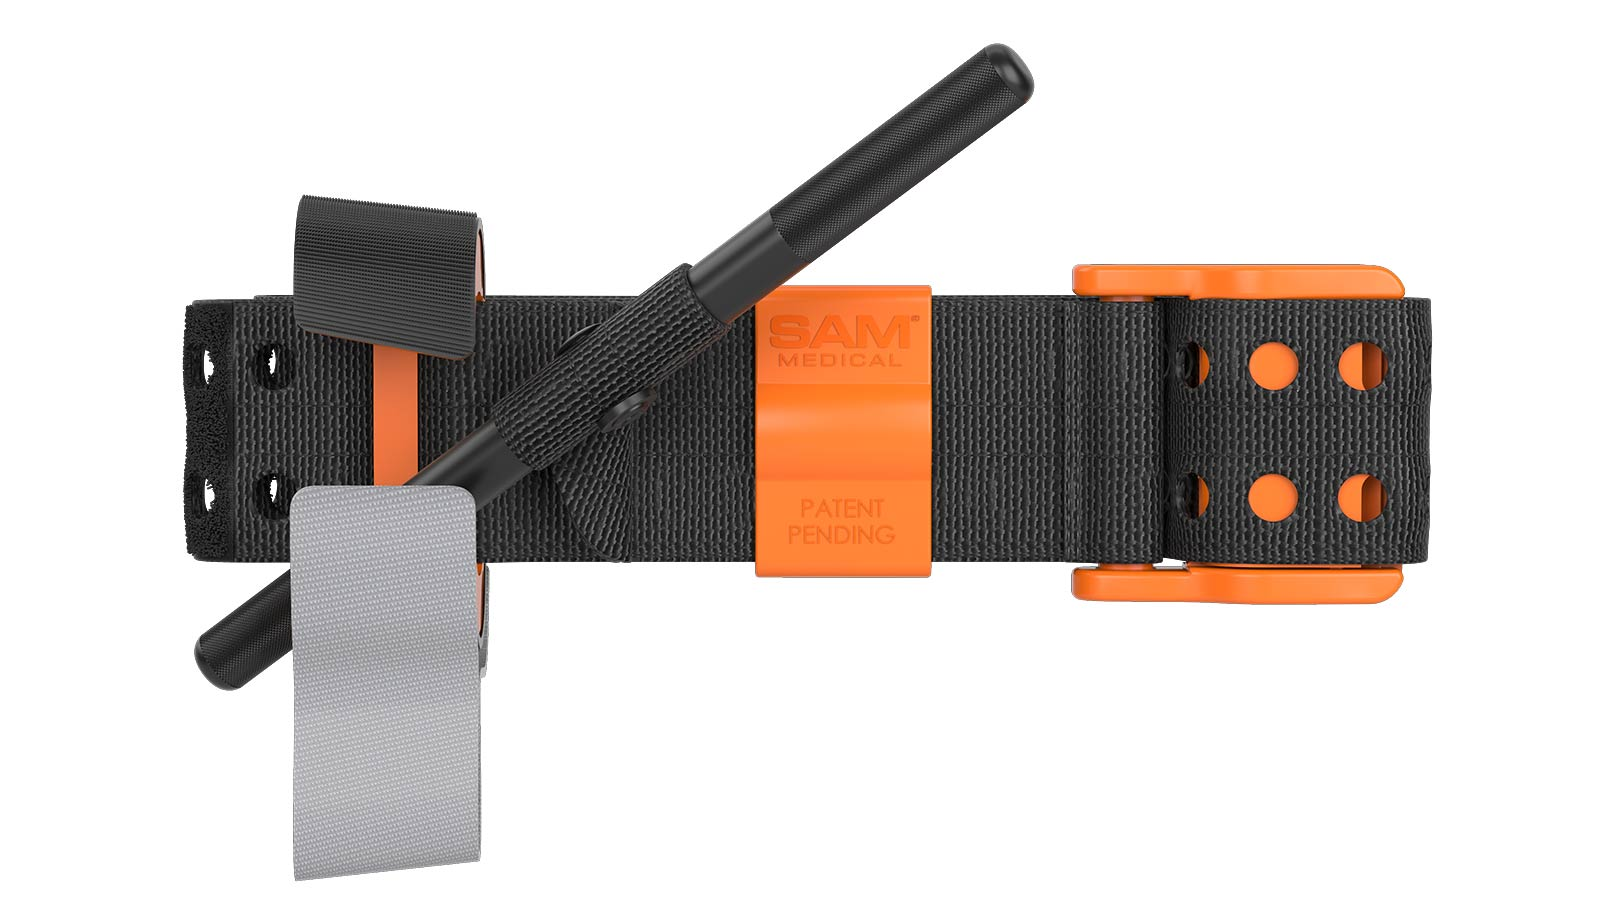 3D rendered black and orange tourniquet against white background